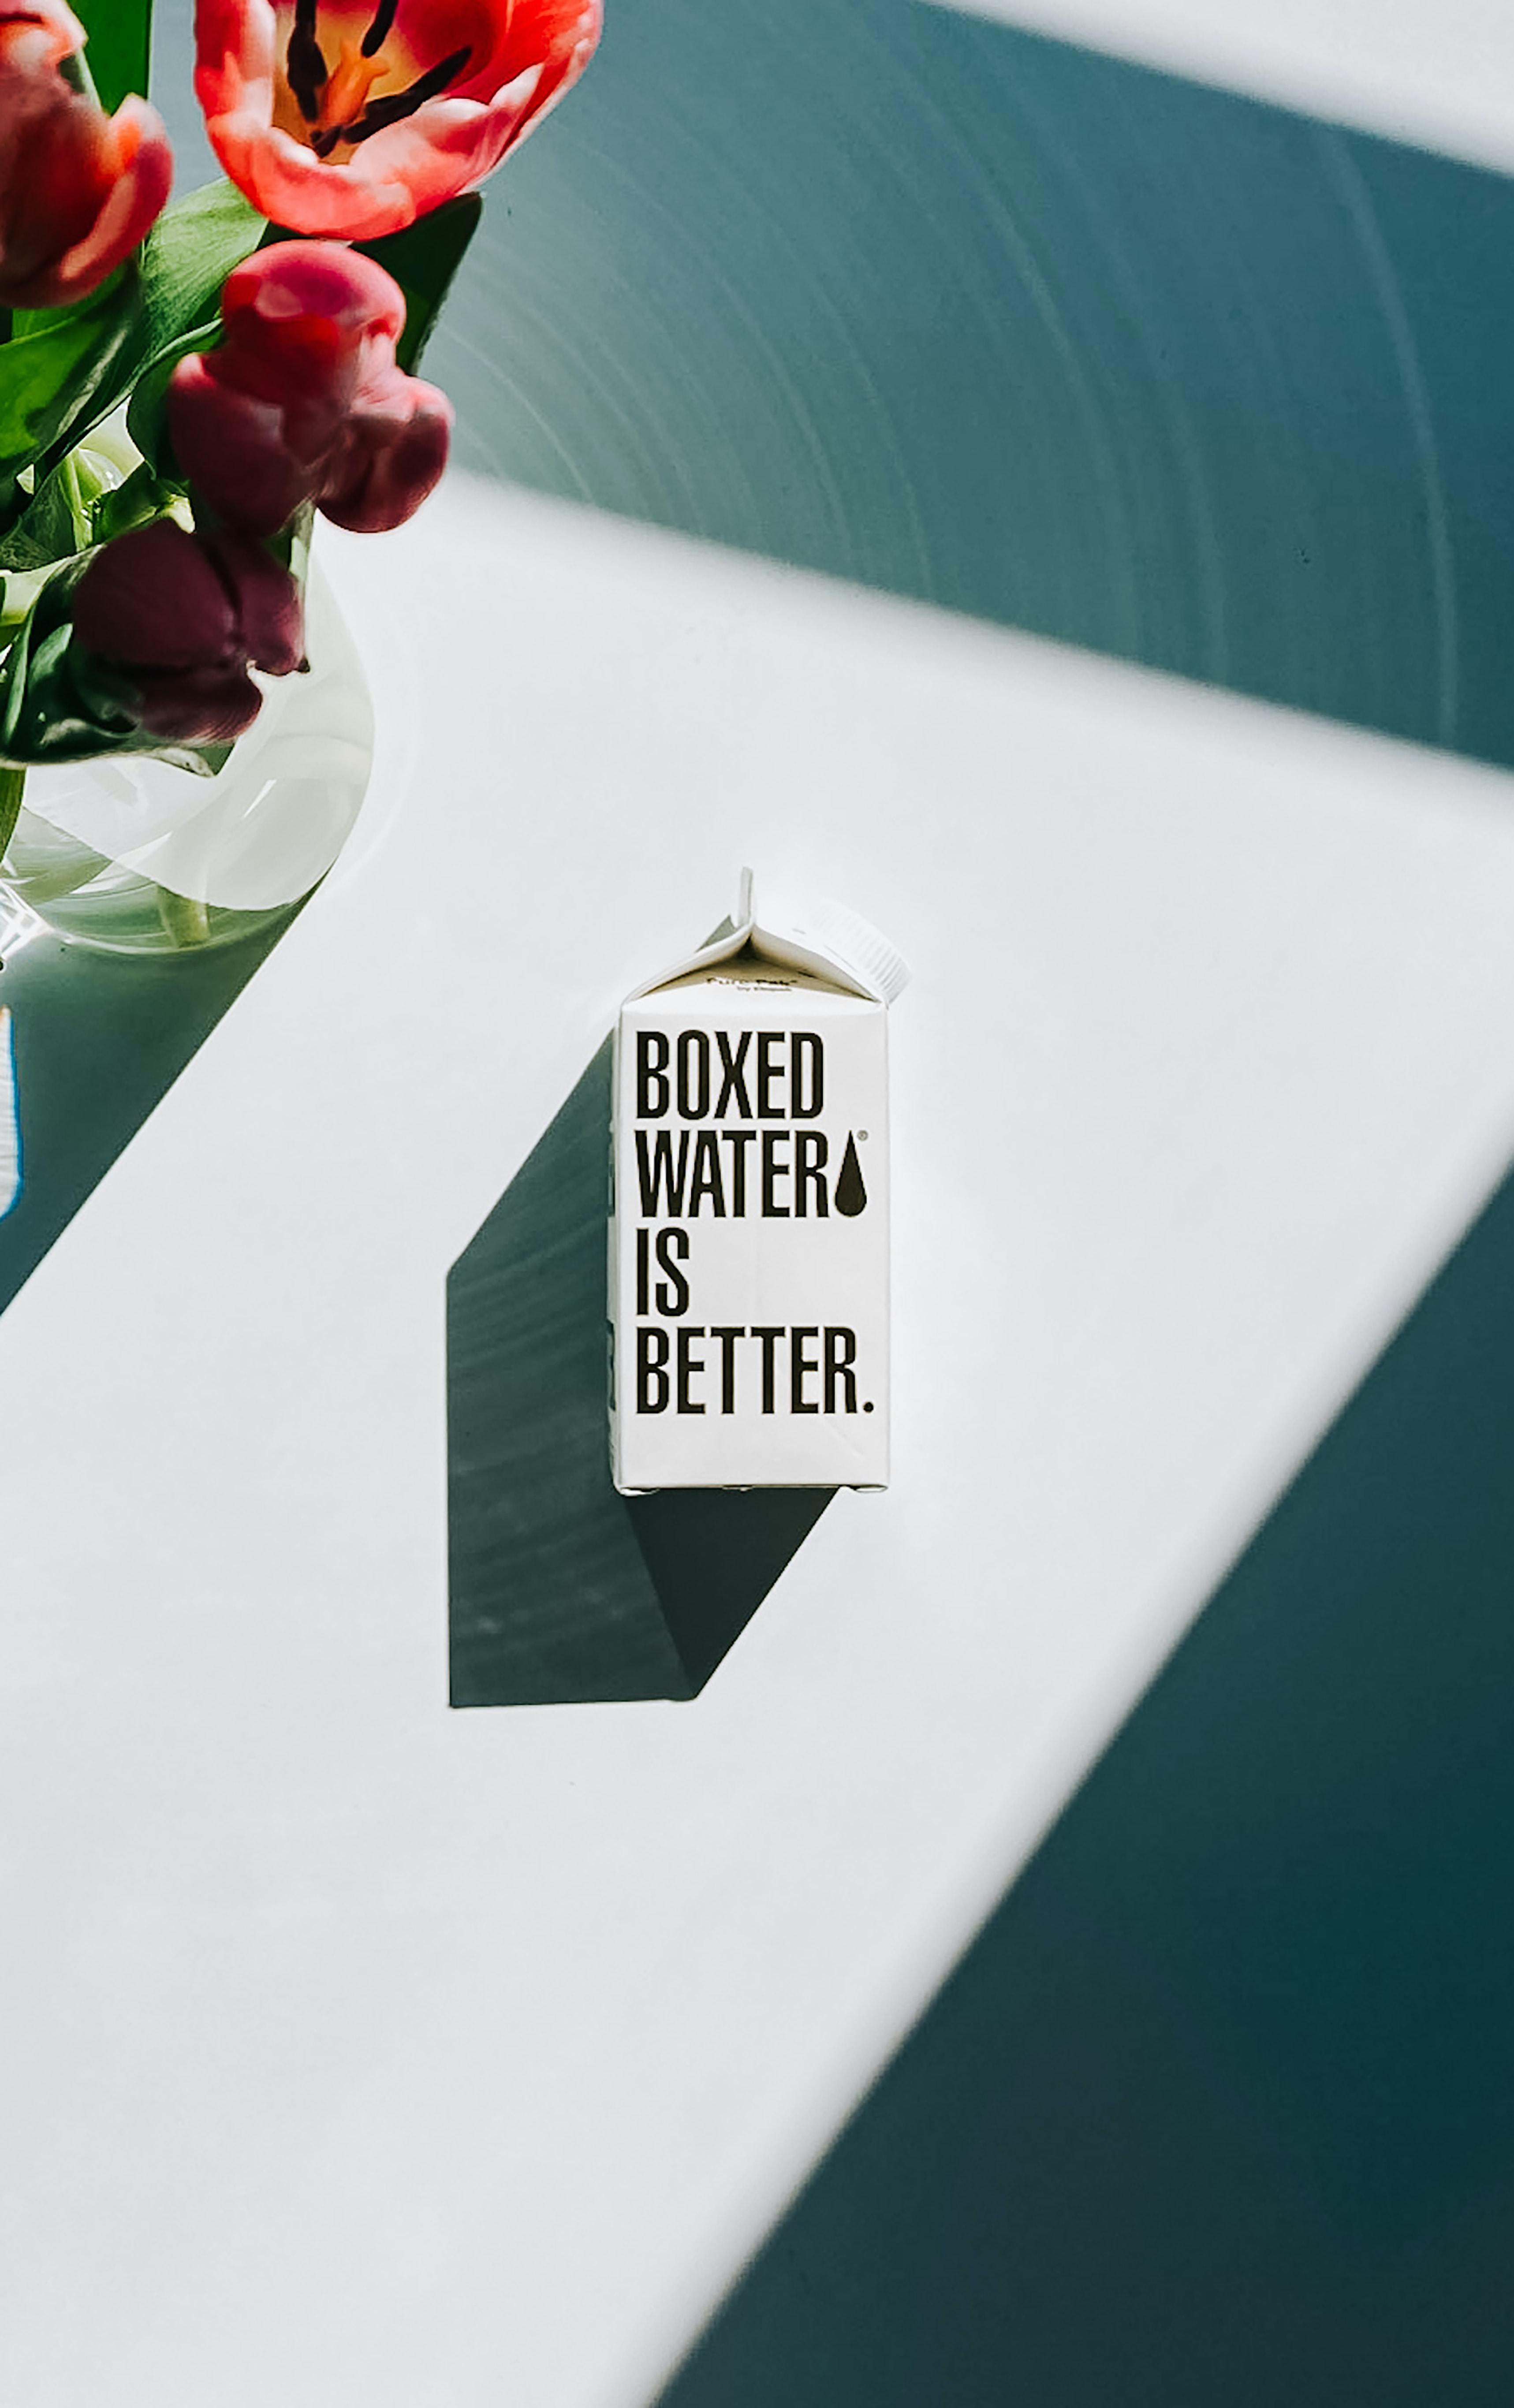 boxed-water-is-better-LKRBckl4jSI-unsplash